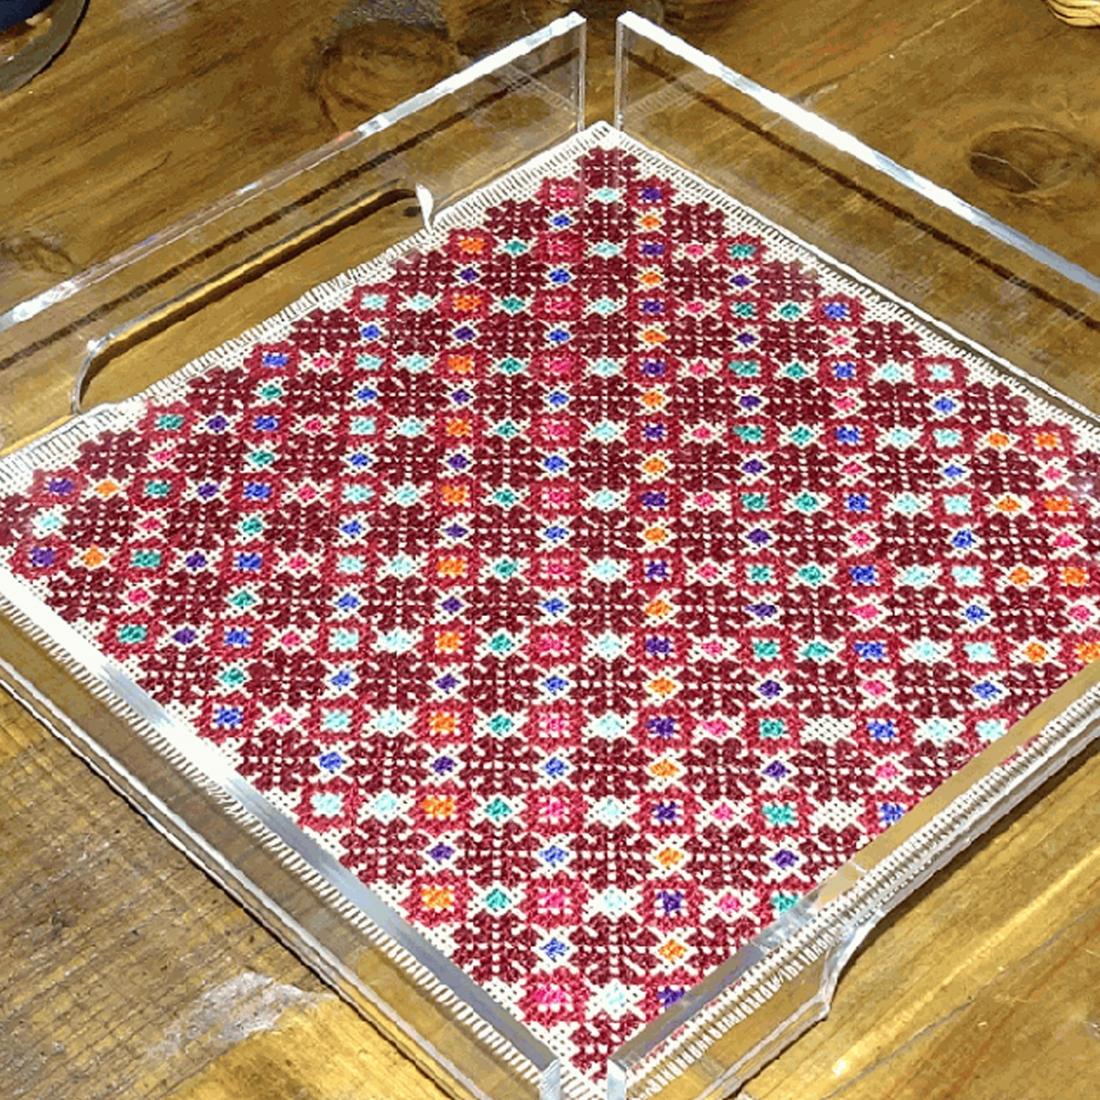 Plexi square small Tray w/ Hand-Embroidered Insert